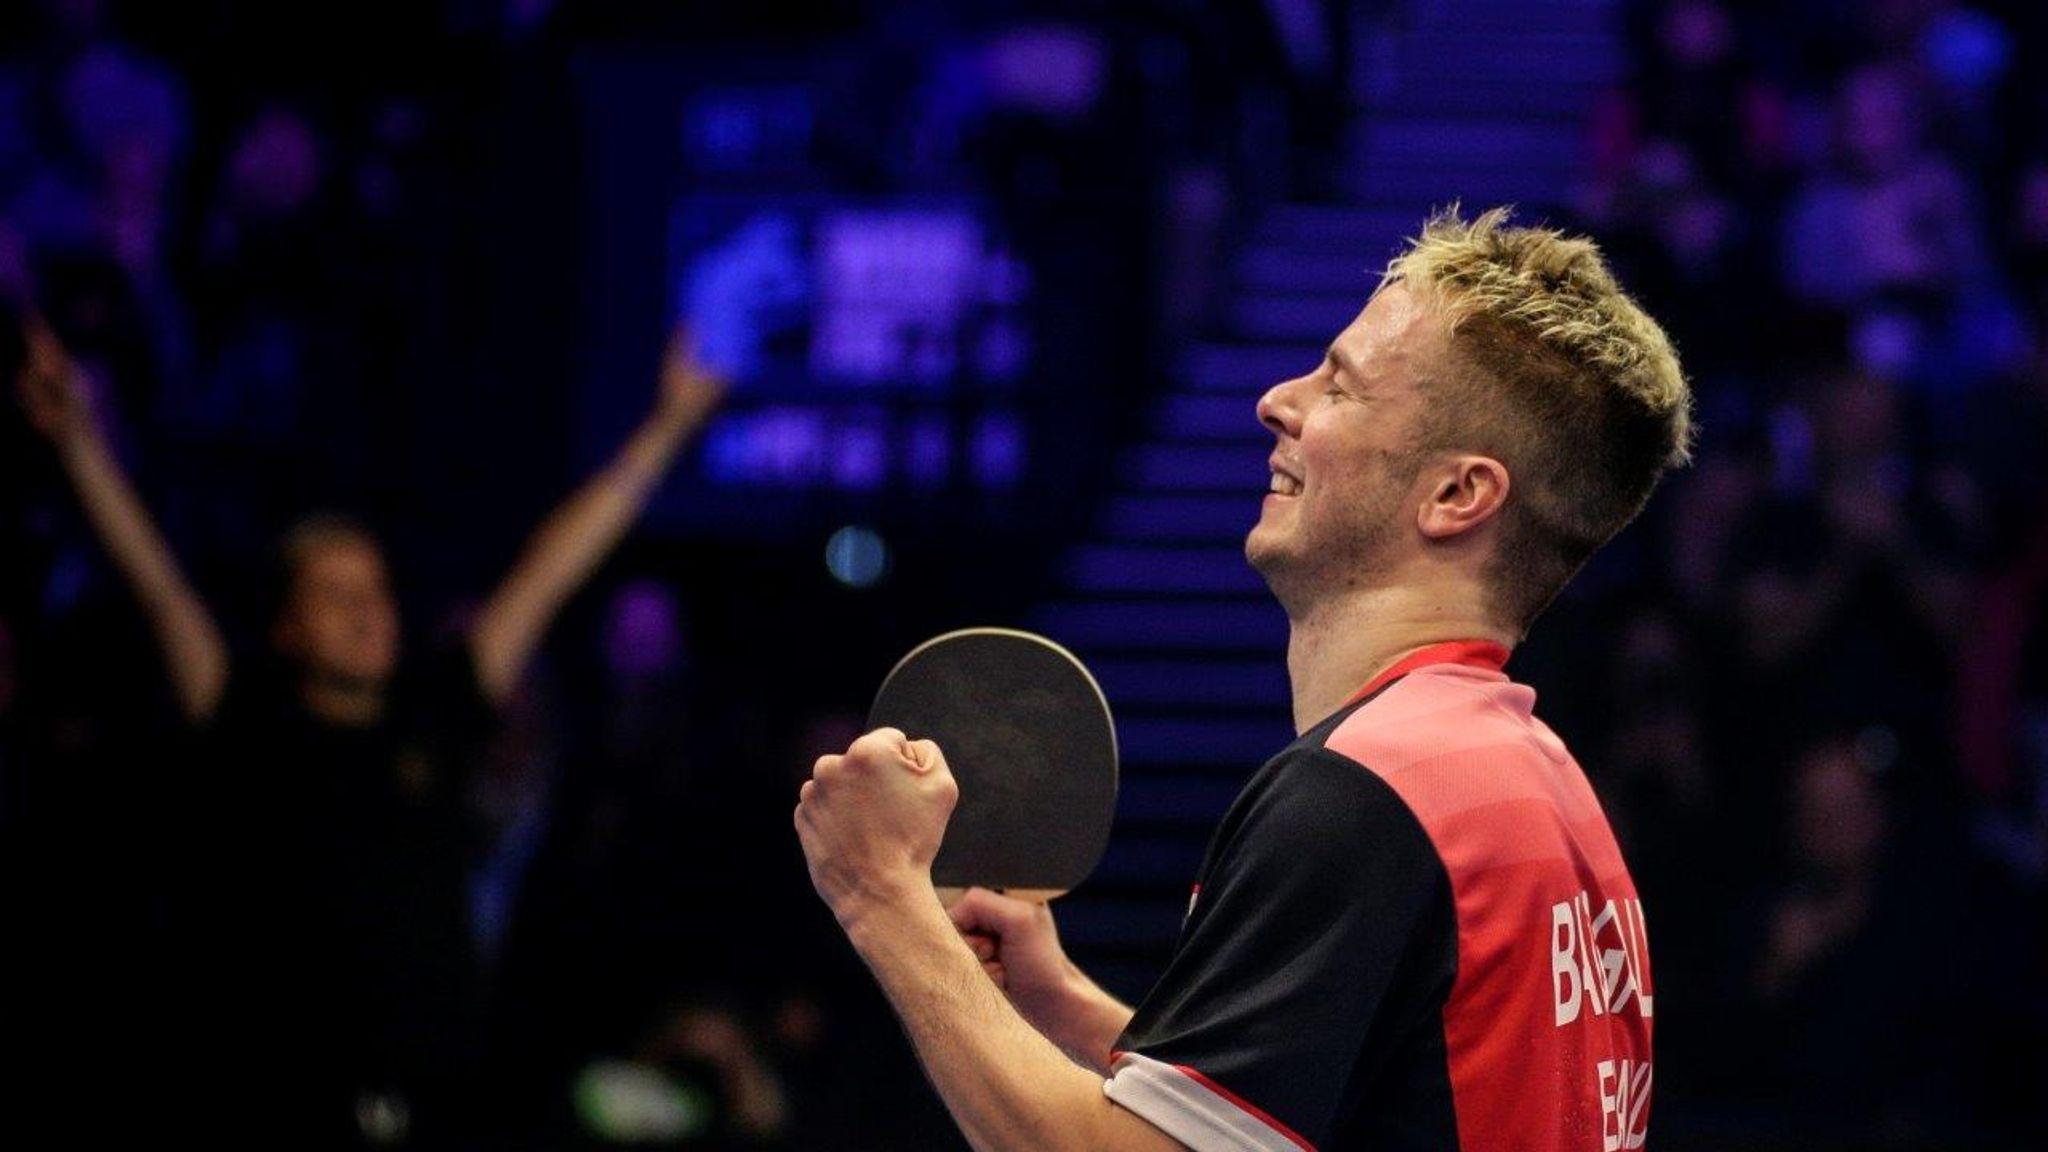 World championship of ping pong betting on sports betting gods blogspot